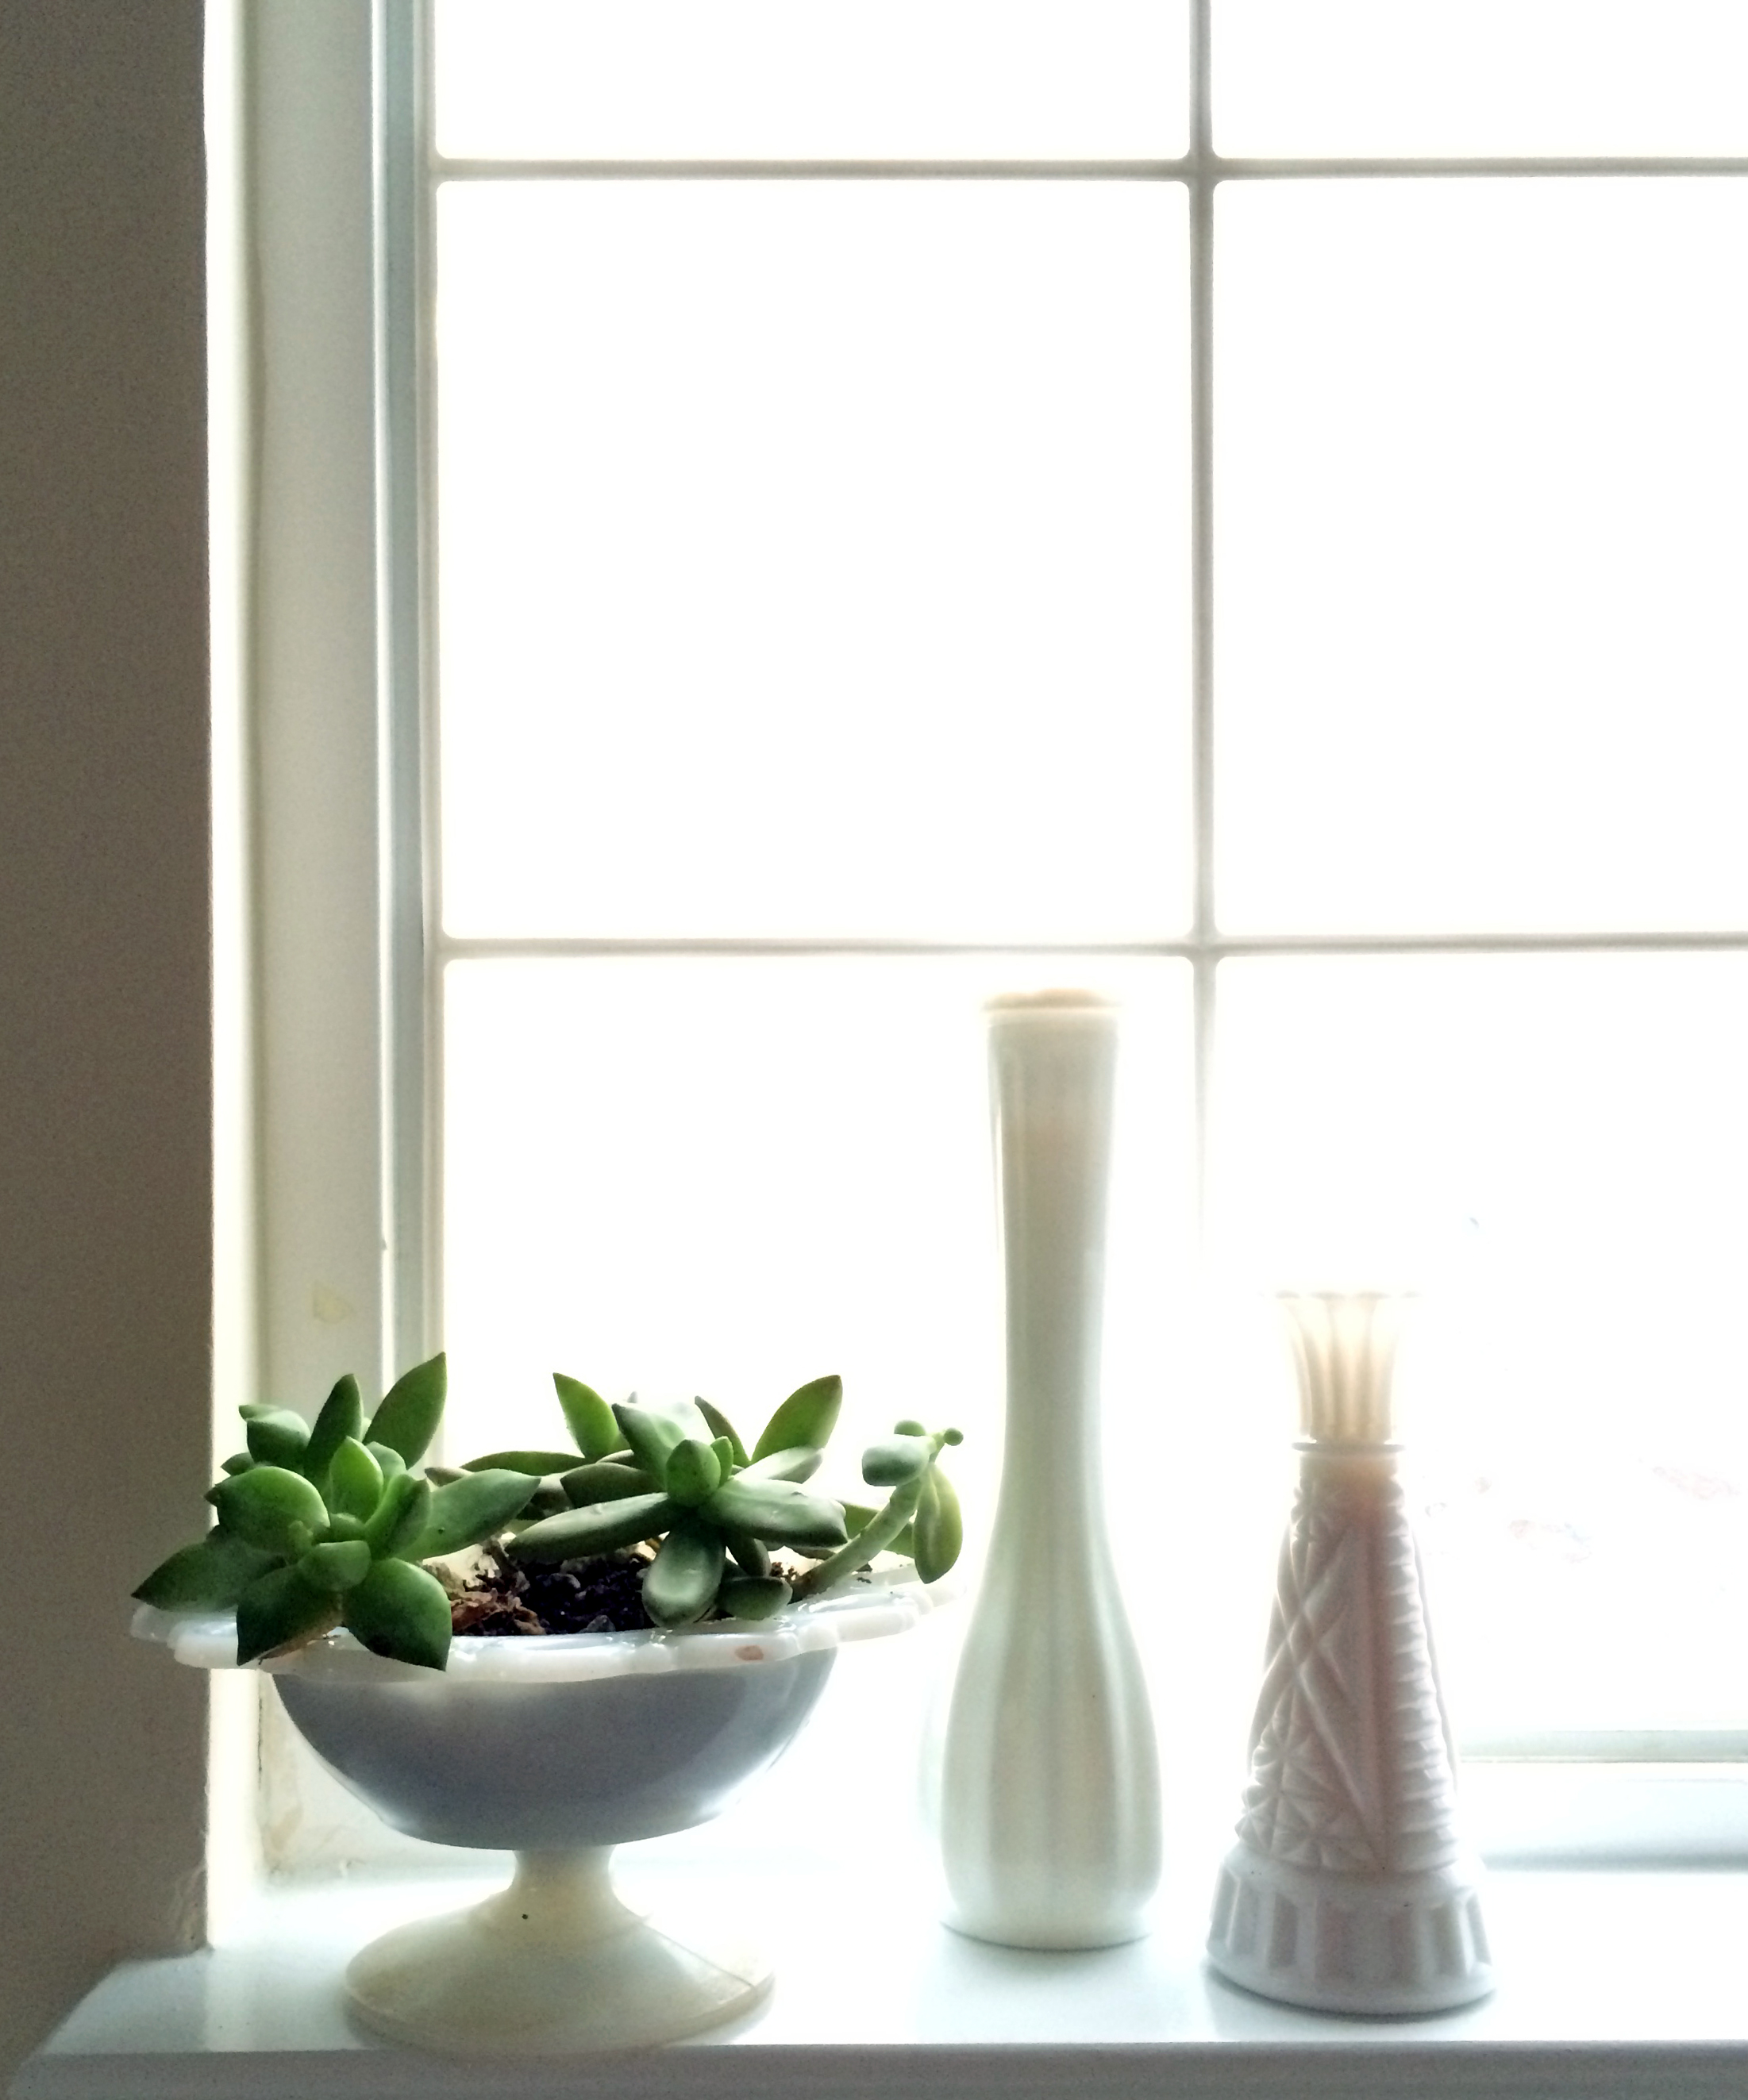 milkglass and succulents